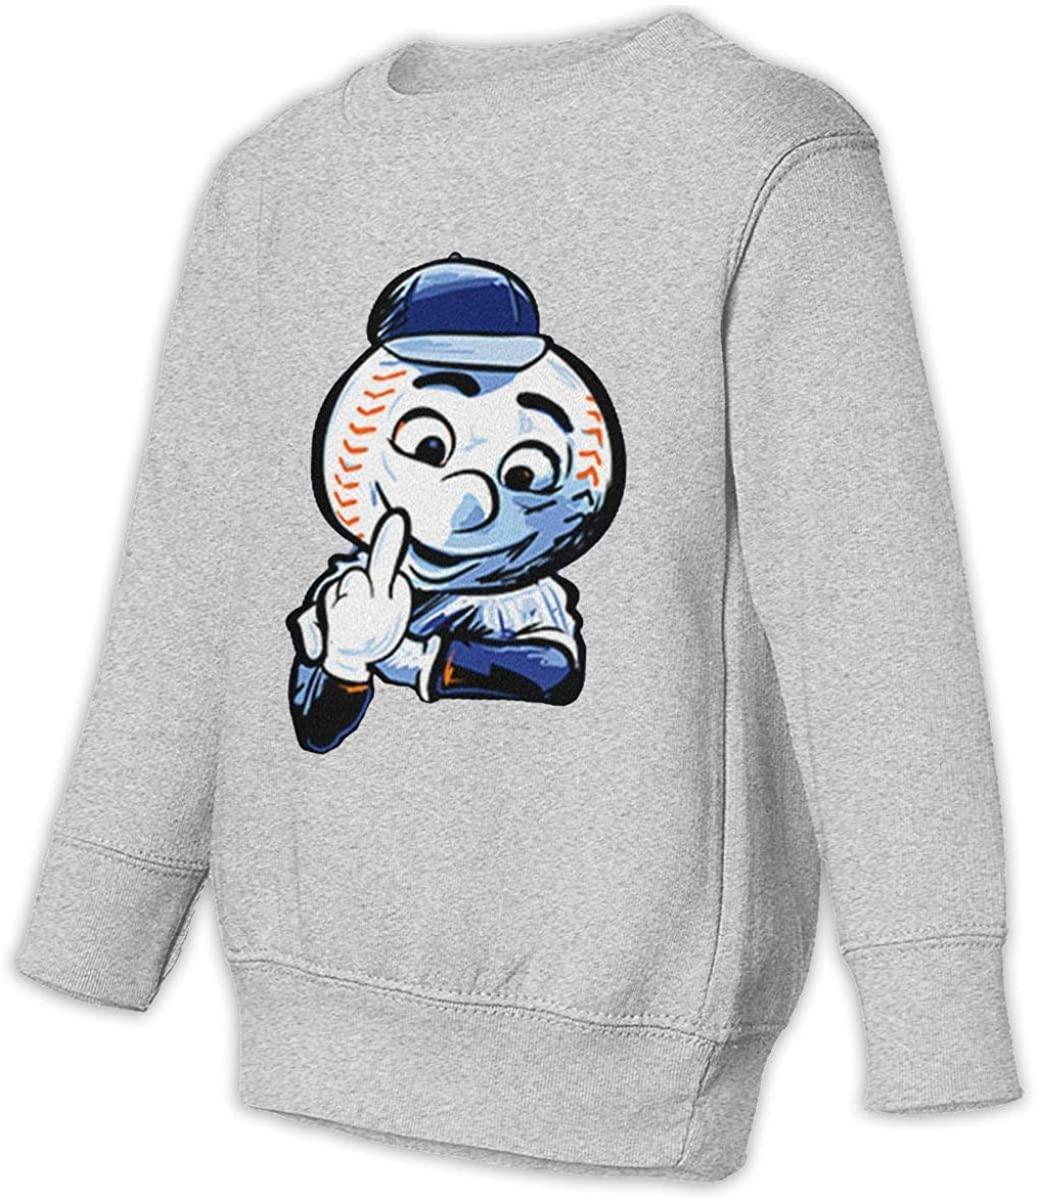 1836 New York Baseball Fans Mr. Met Unisex Sweatshirt Youth Boy and Girls Pullover Sweatshirt 3t Gray